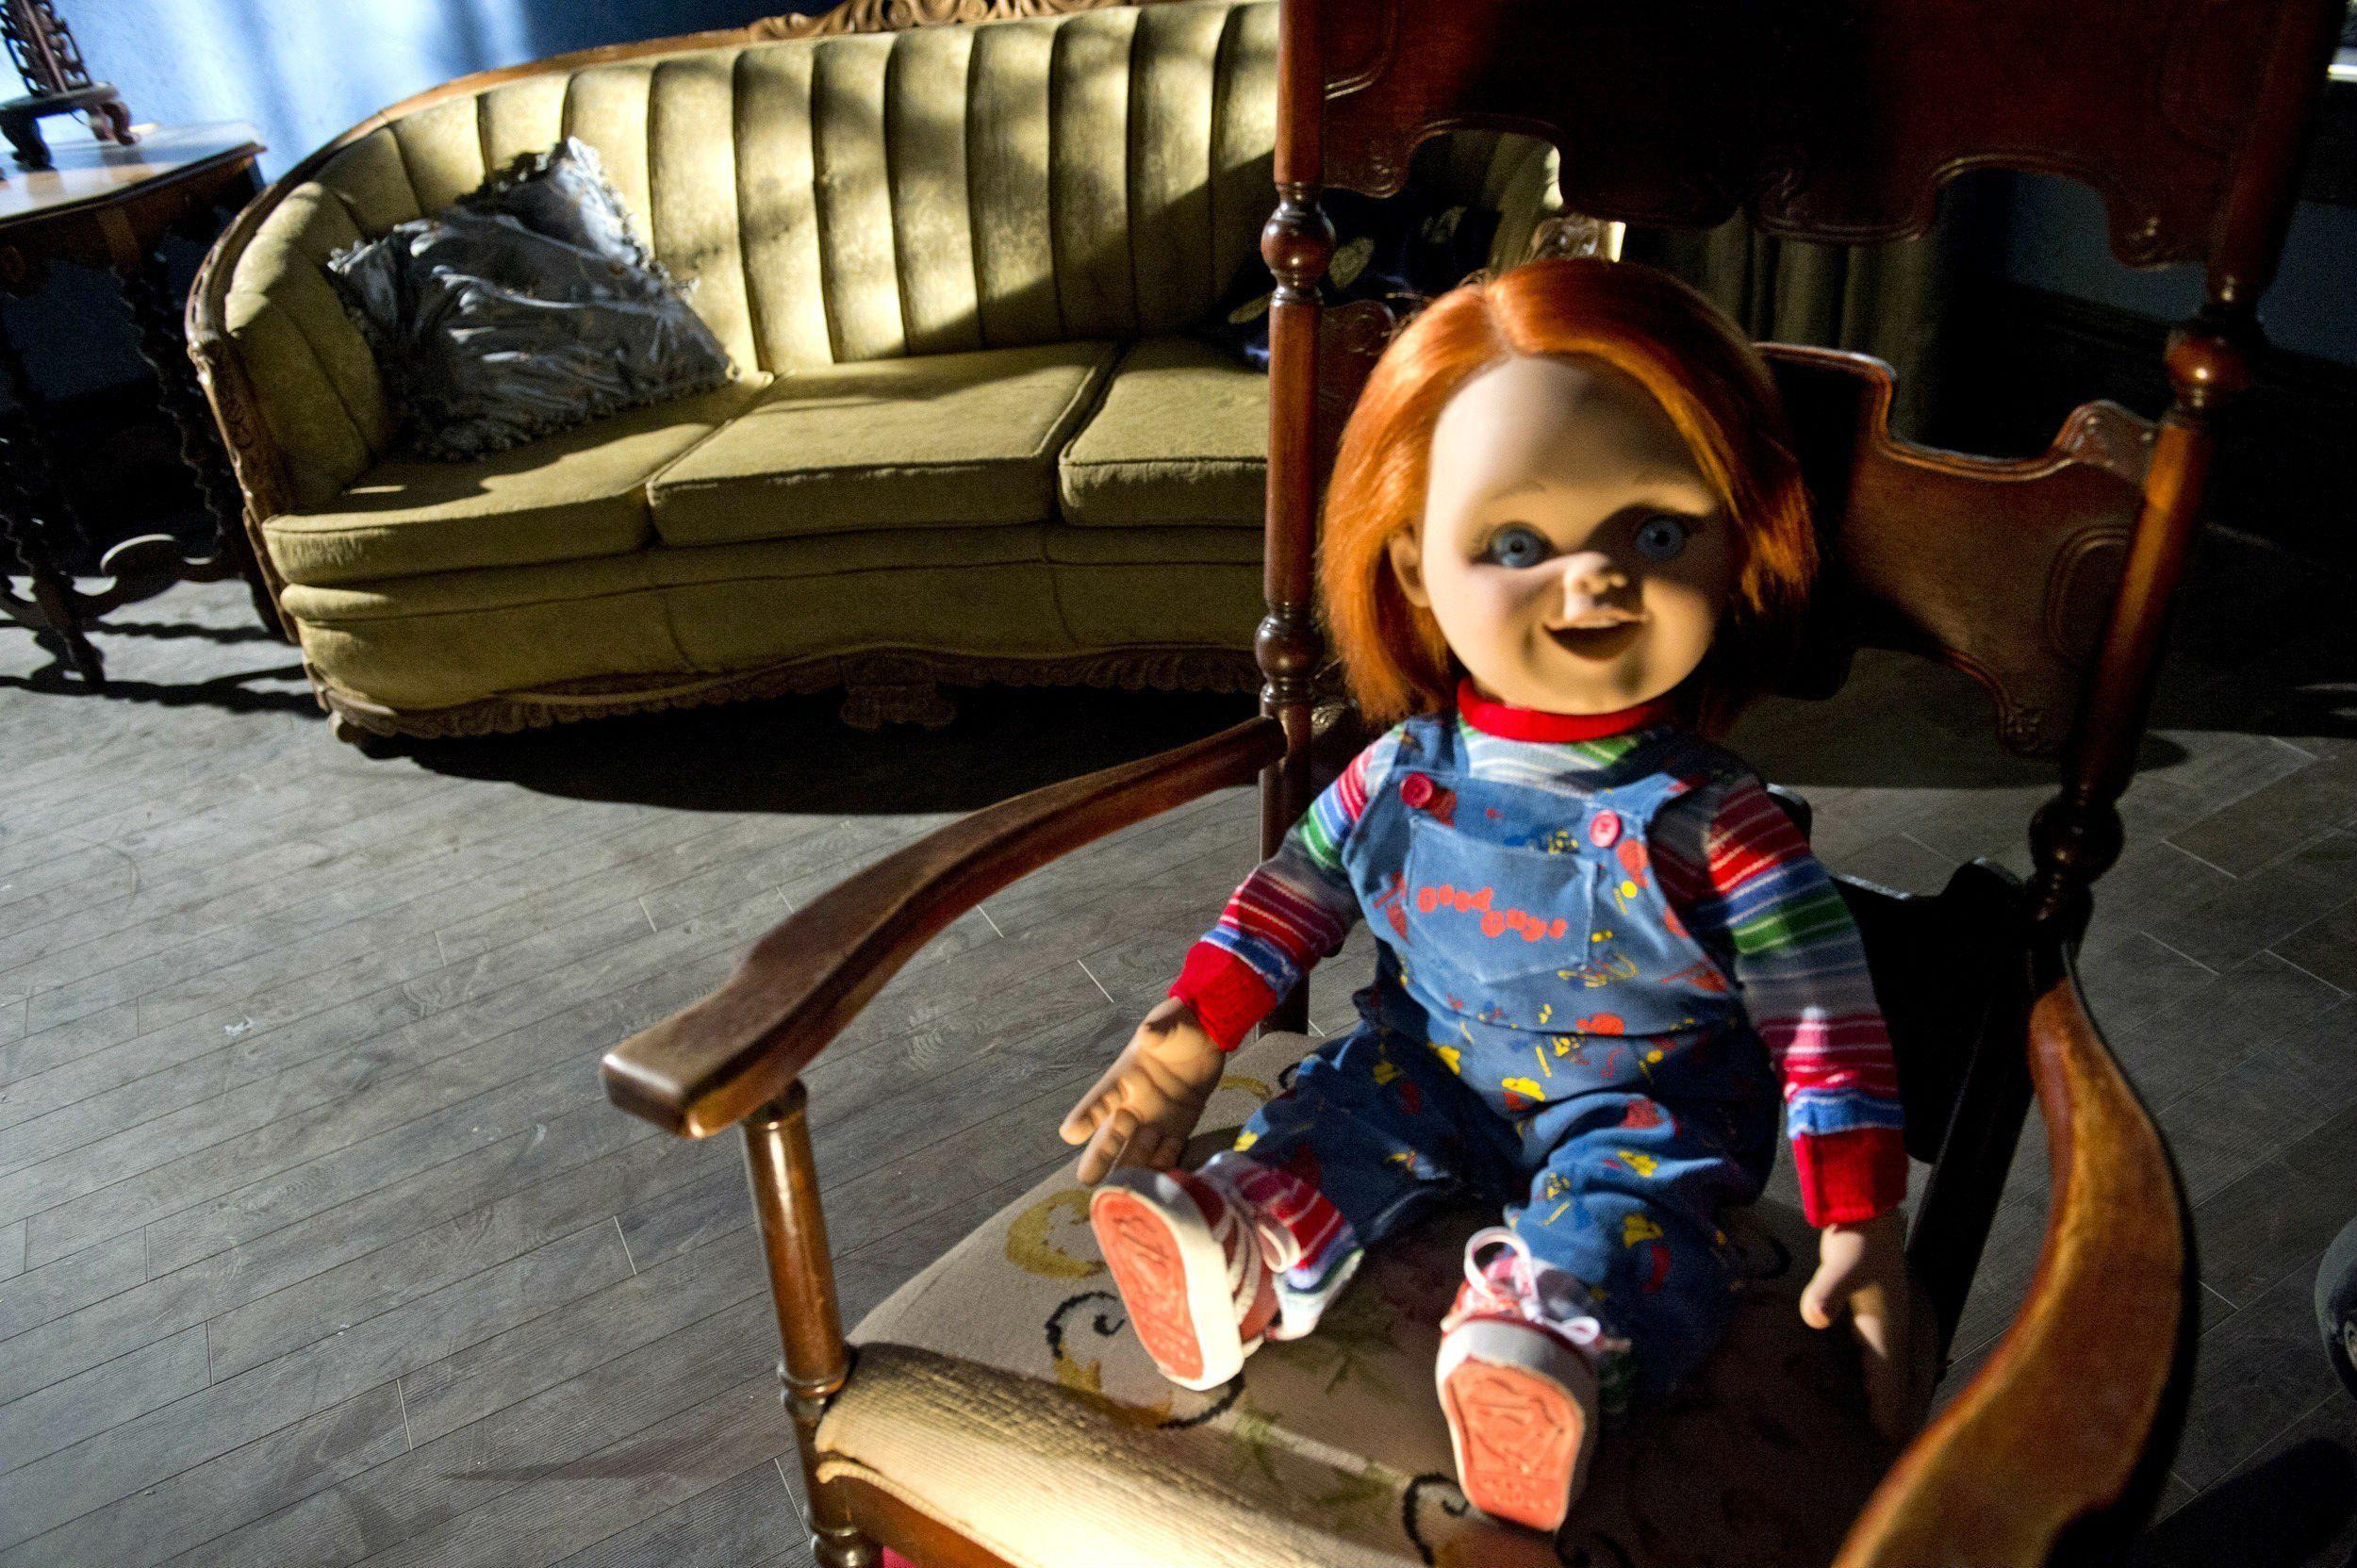 Chucky and Tiffany Wallpaper – WallpaperSafari